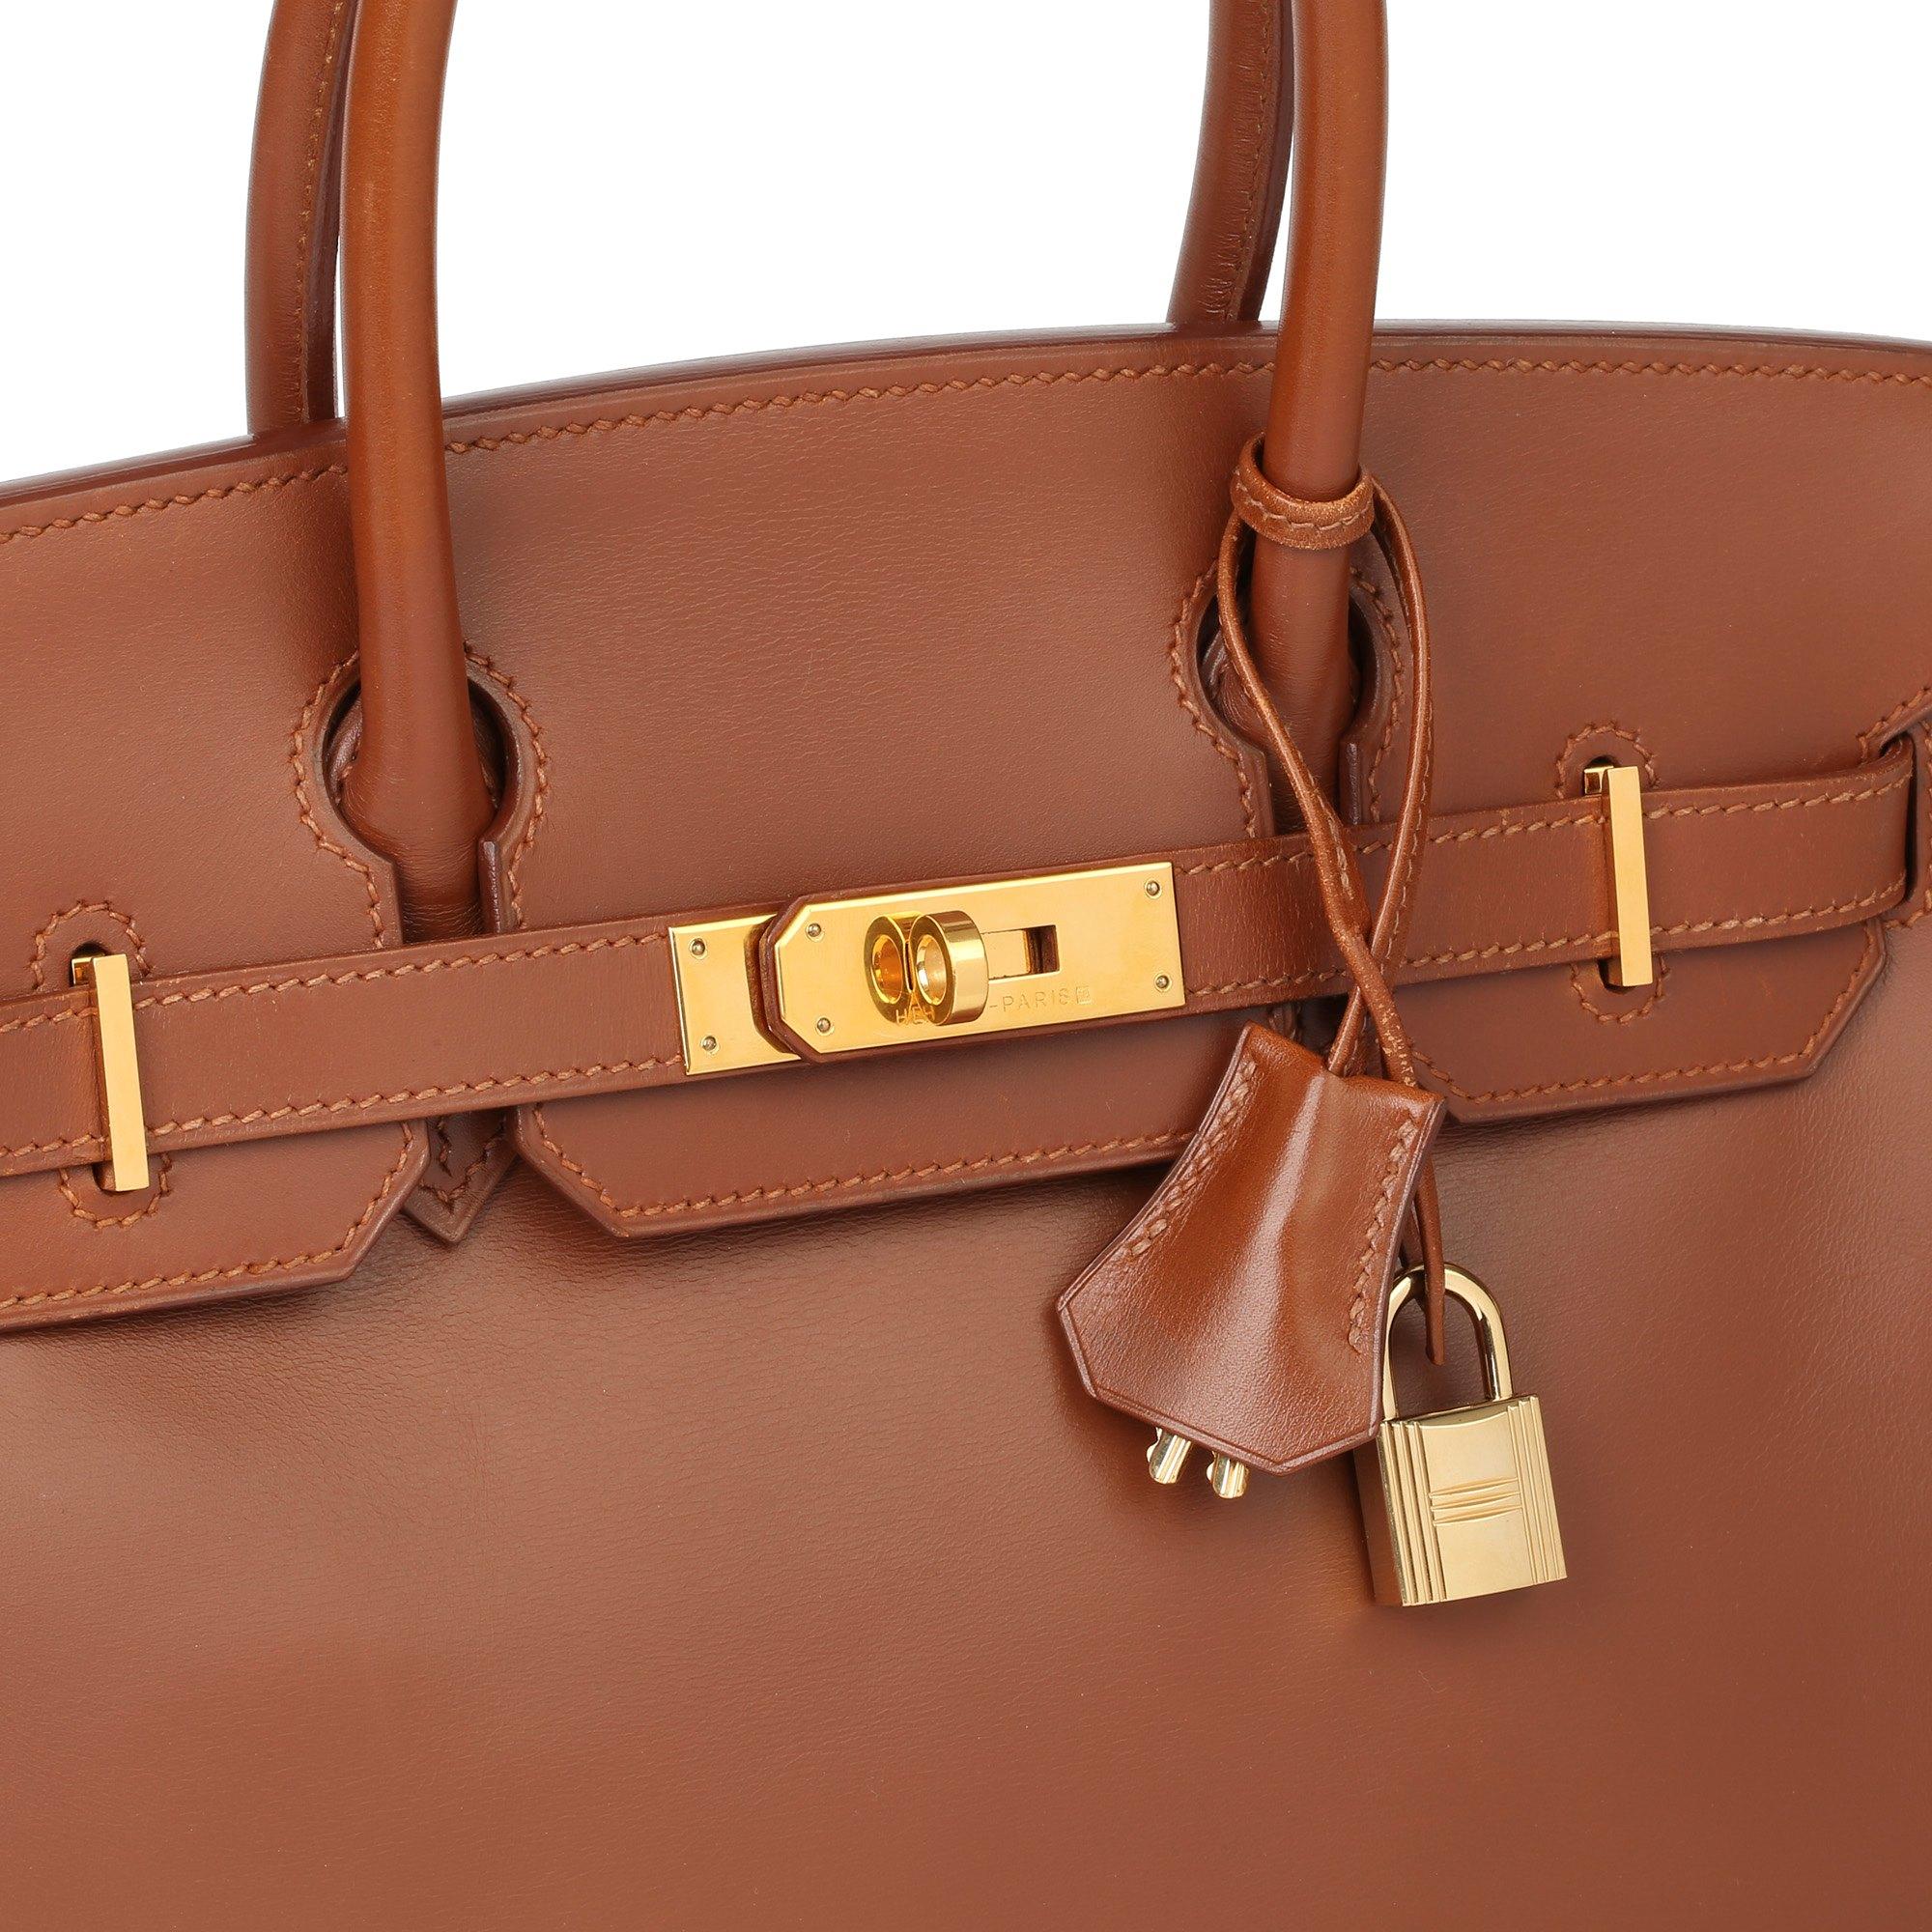 Hermès Fauve Box Calf Leather & Parchemin Verso Birkin 30cm Retourne